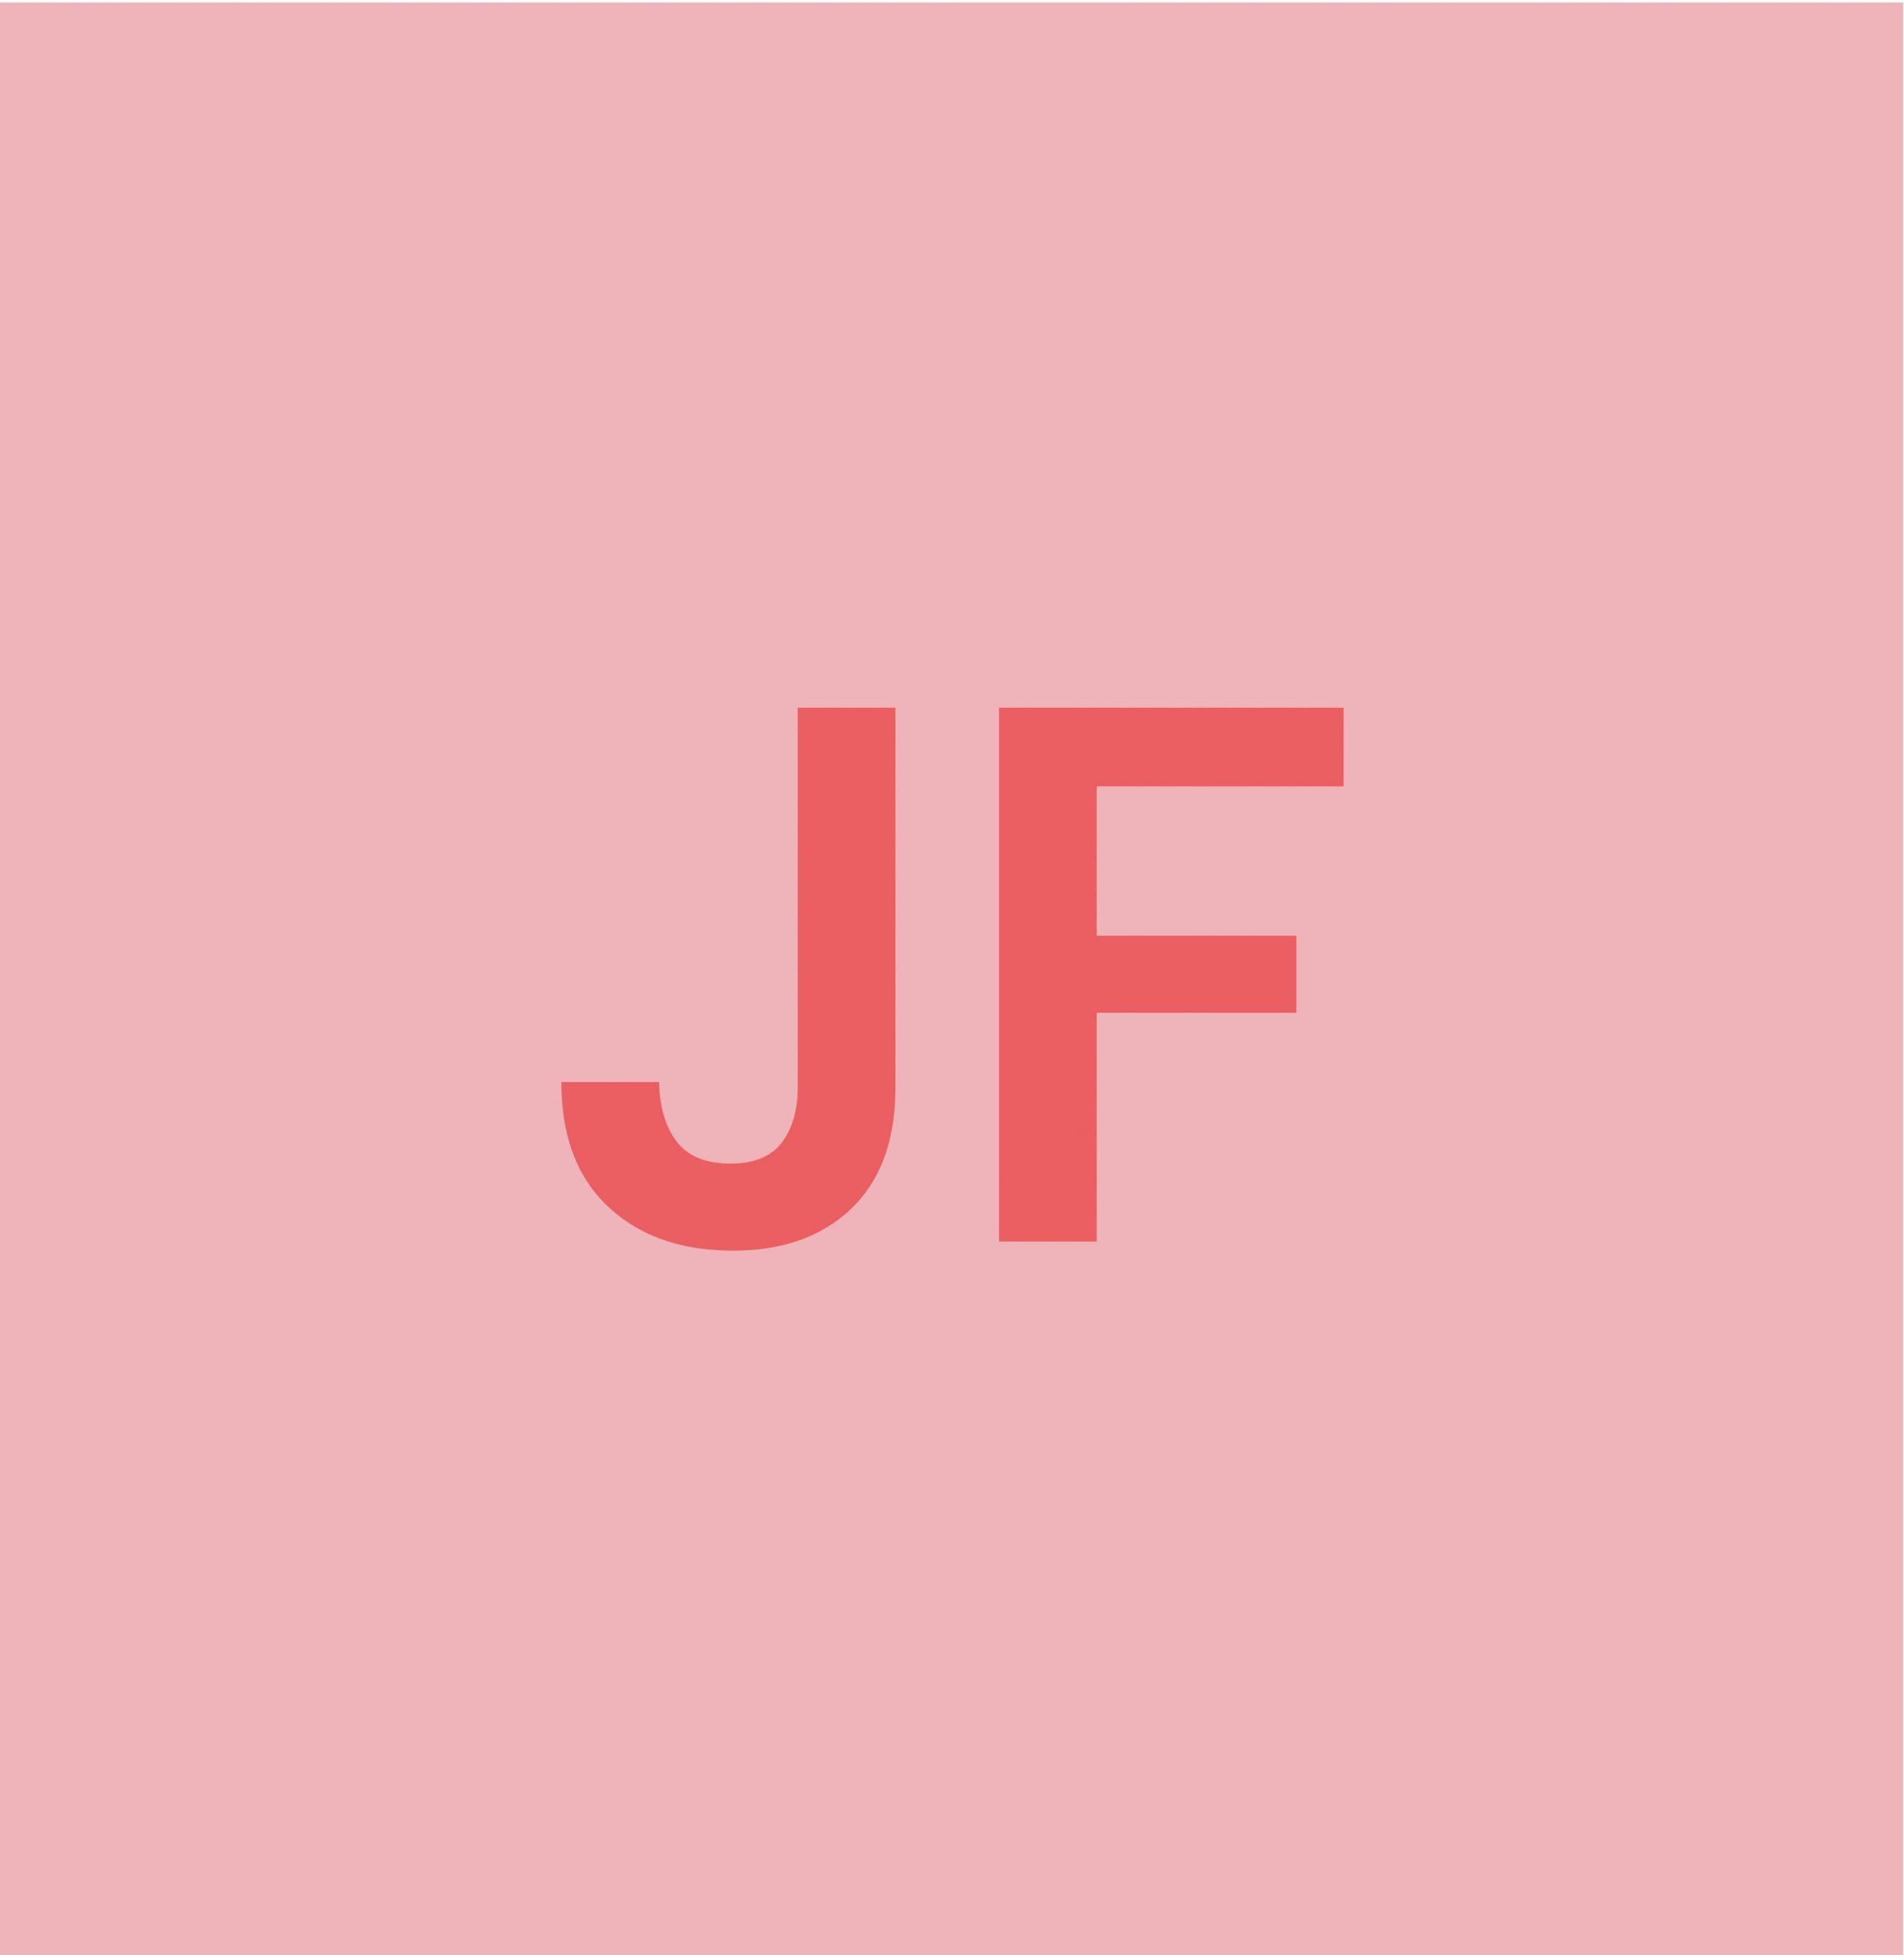 JF Testimonial